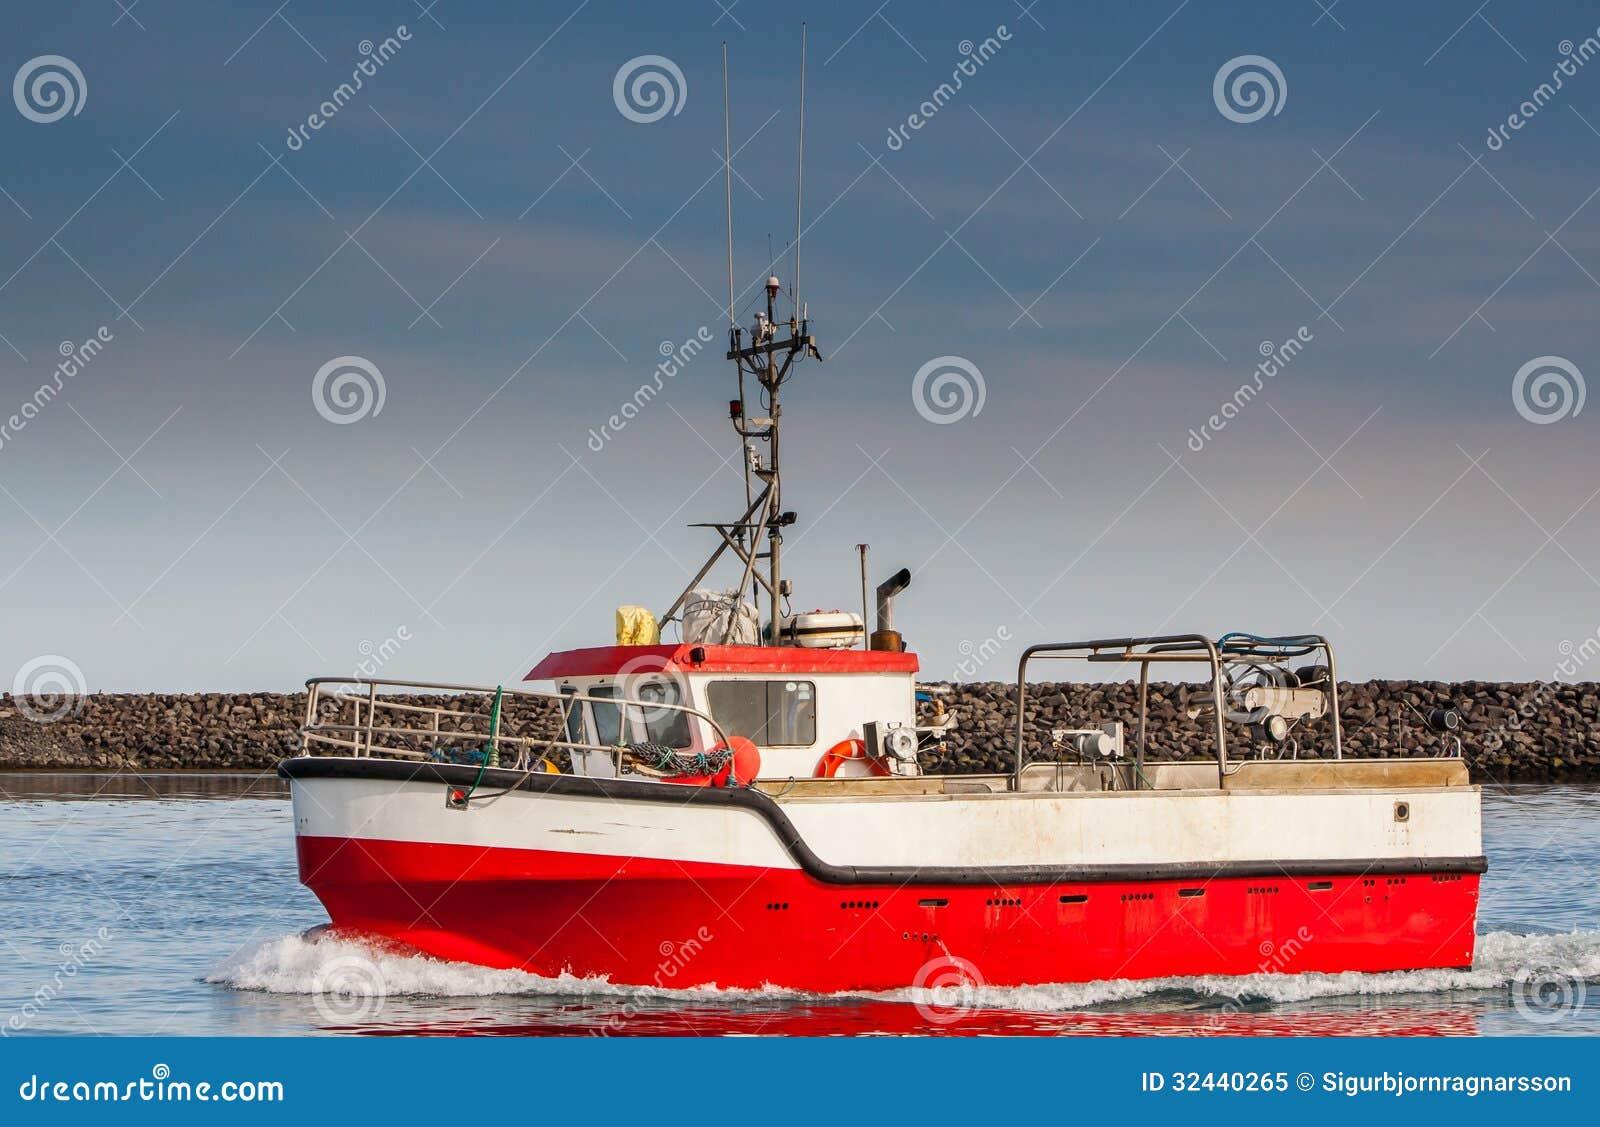 Fishing Boat Royalty Free Stock Photo - Image: 32440265